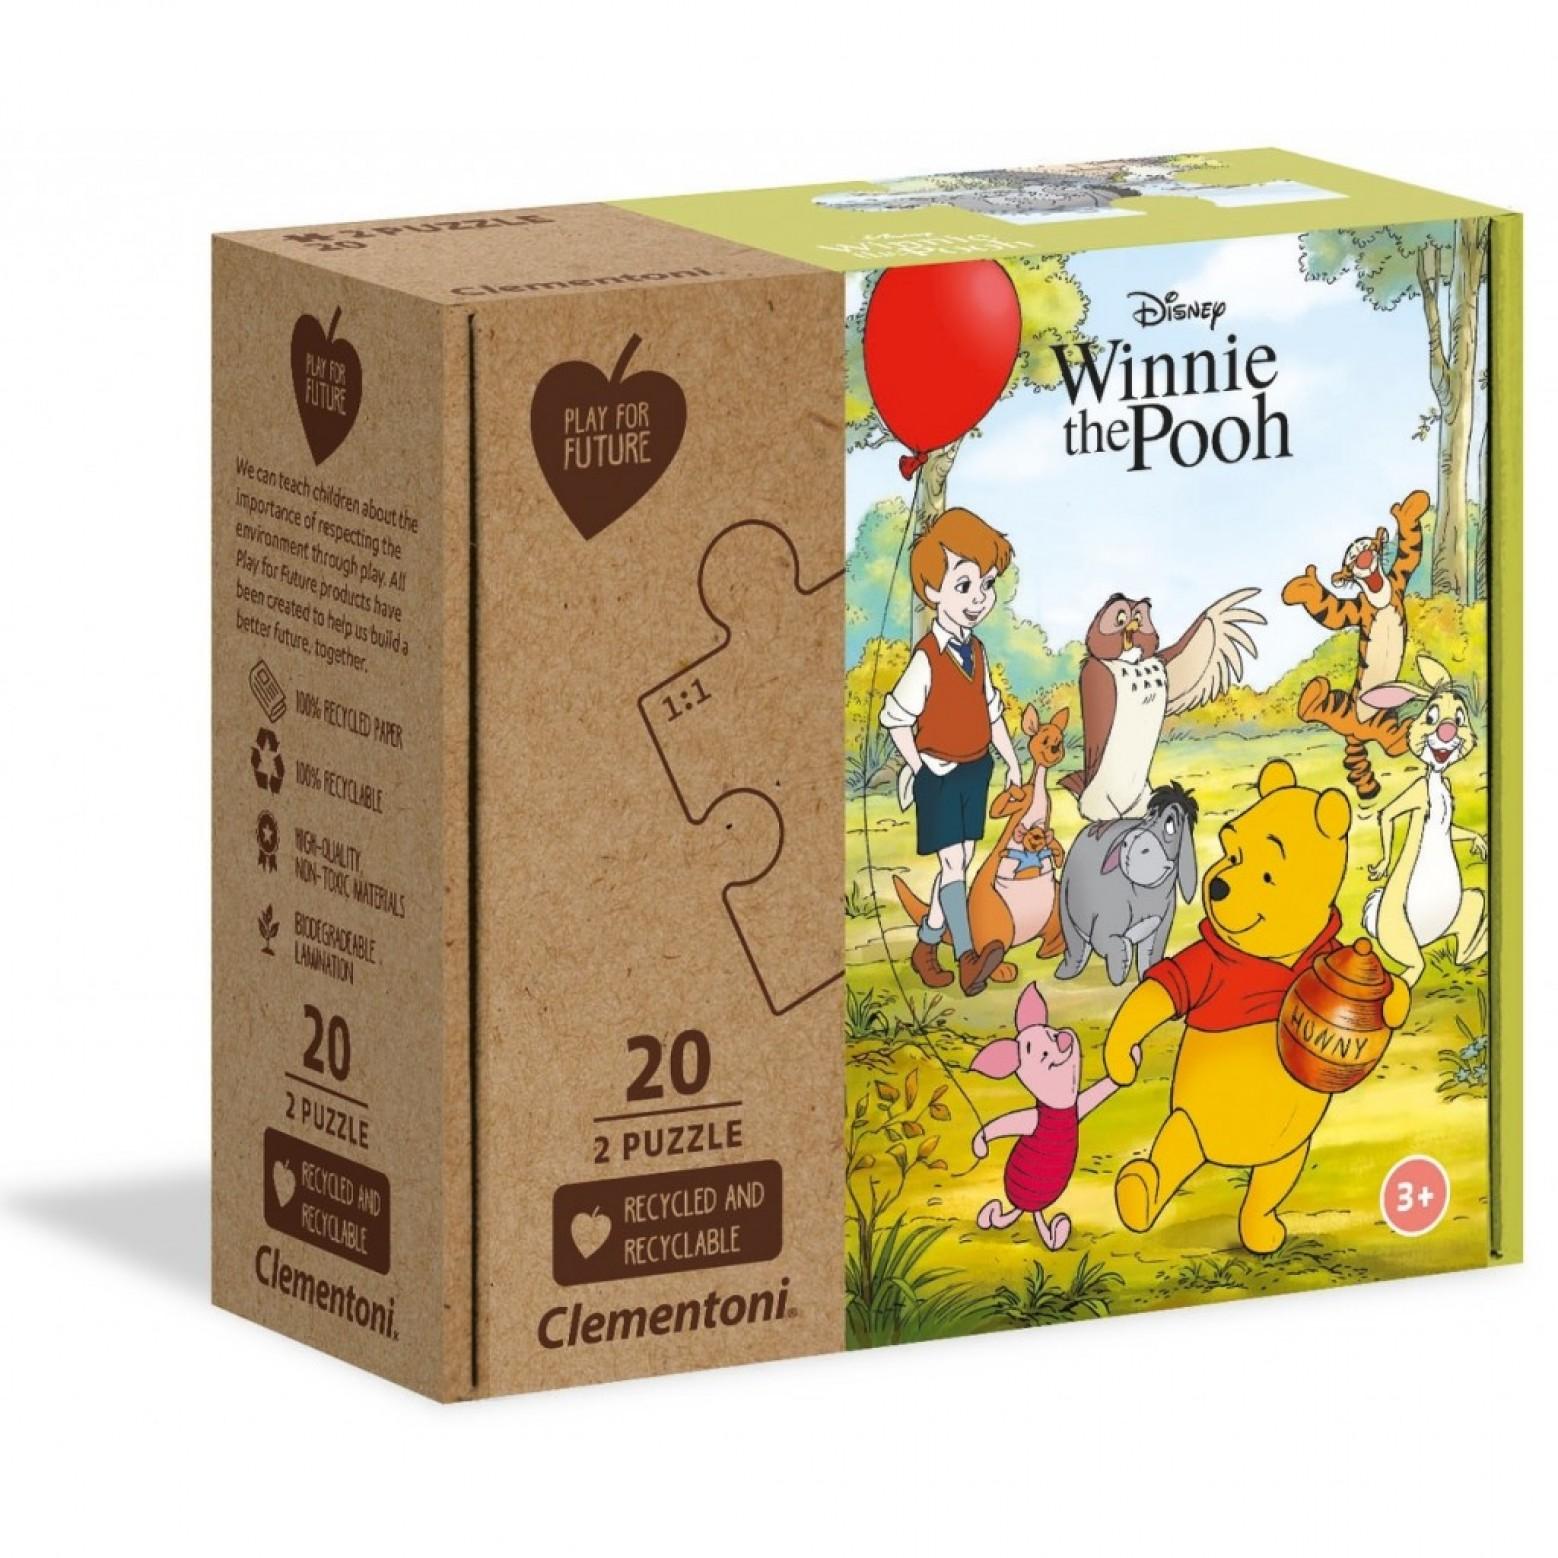 Winnie de pooh puzzel 2 x 20 stukjes 3+